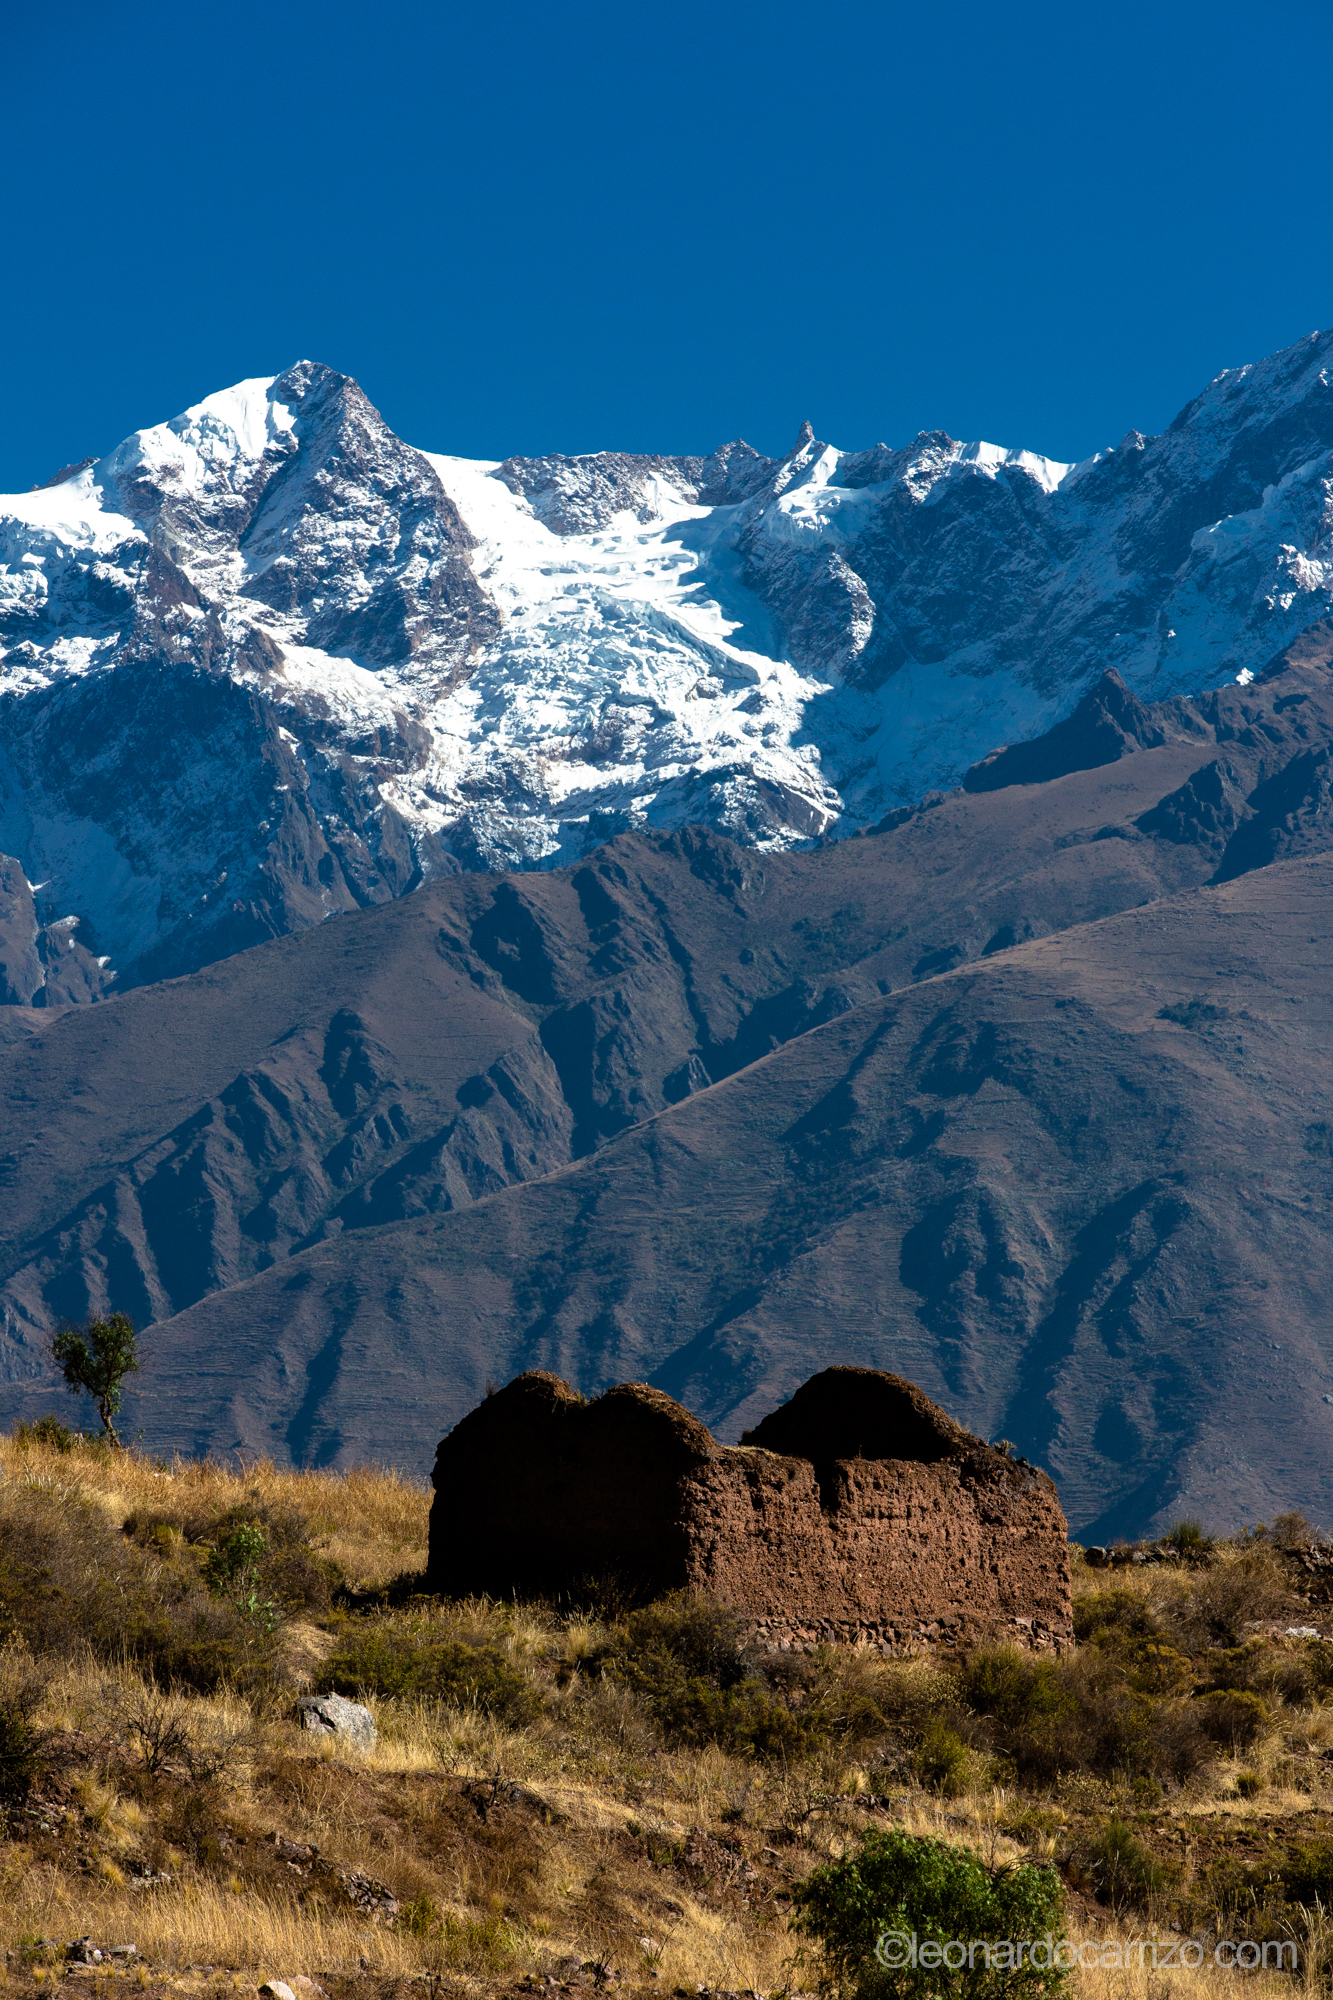 Hike to Inca quarry outside Ollanataytambo, Sacred Valley, Peru. photo by Leonardo Carrizo